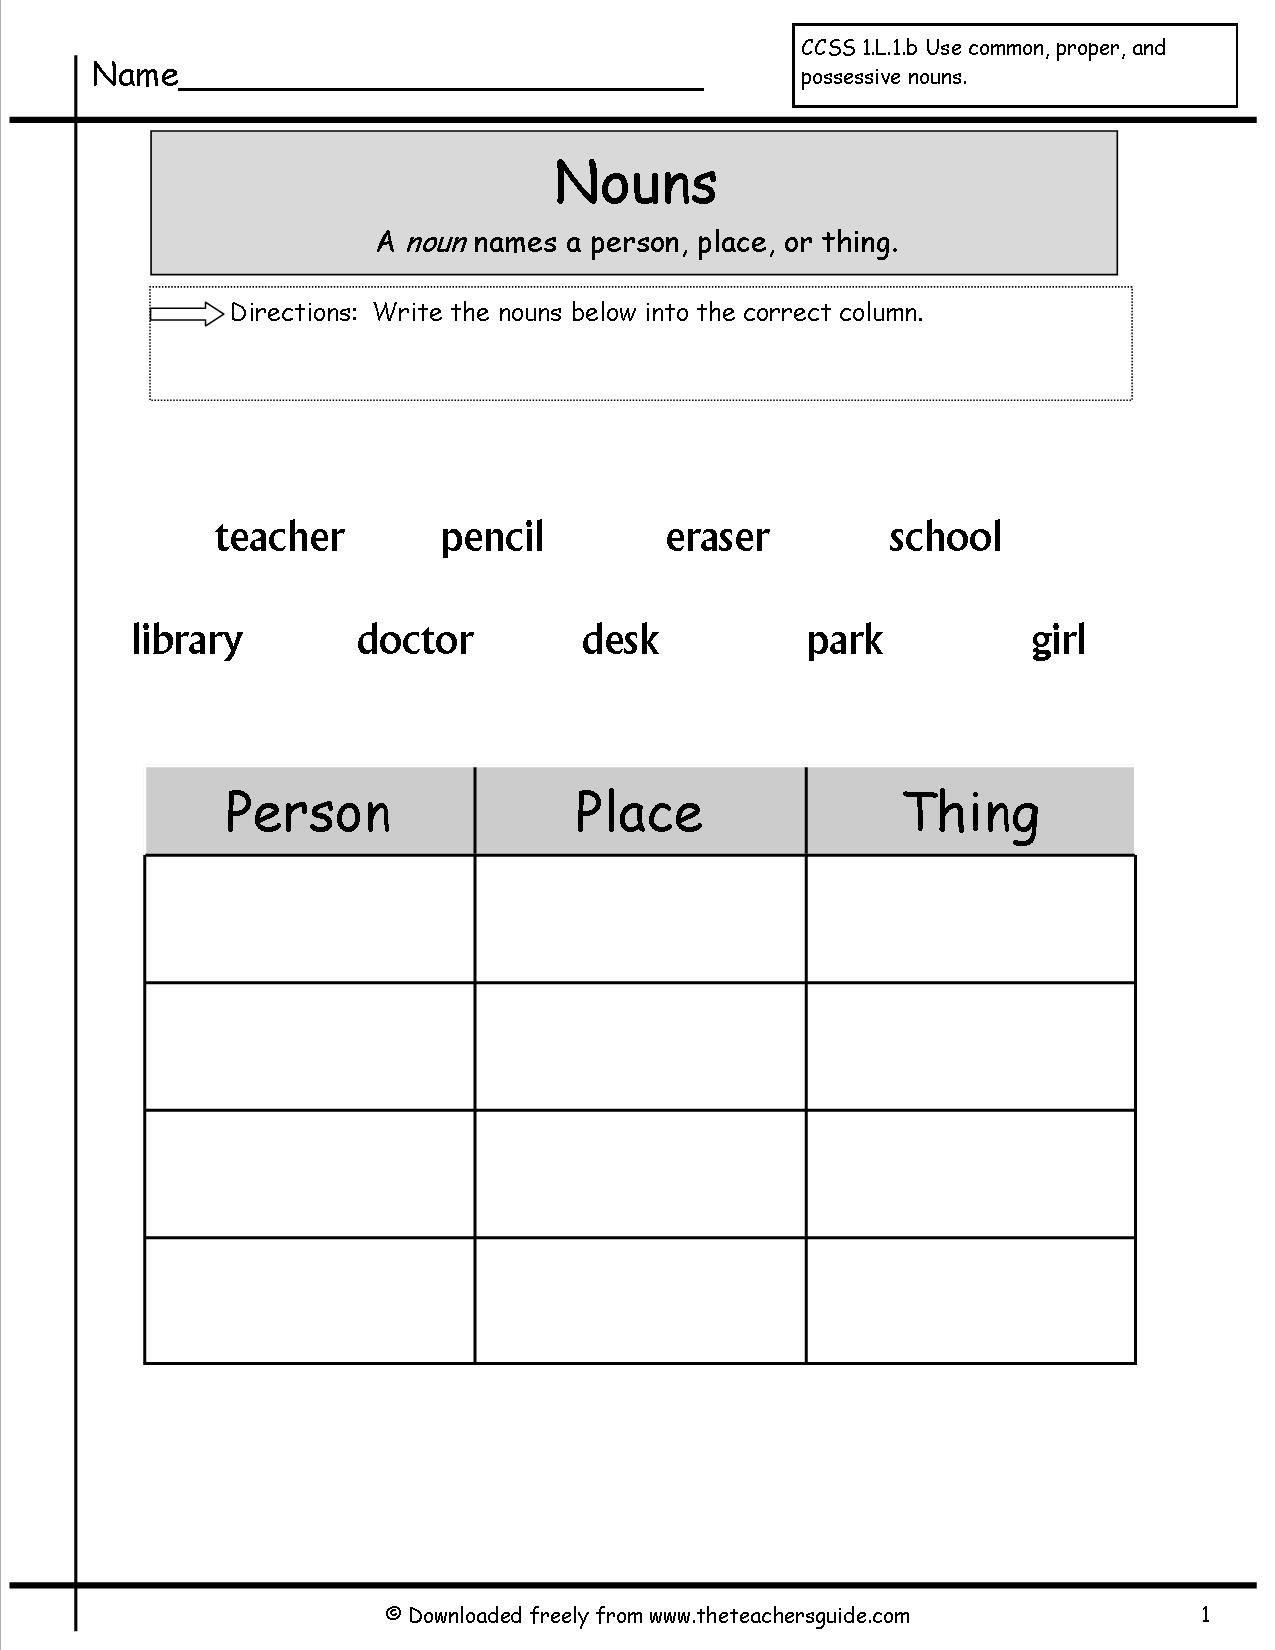 Grammer Printables | Nouns Worksheets Nouns Worksheets Identifying - Free Printable Verb Worksheets